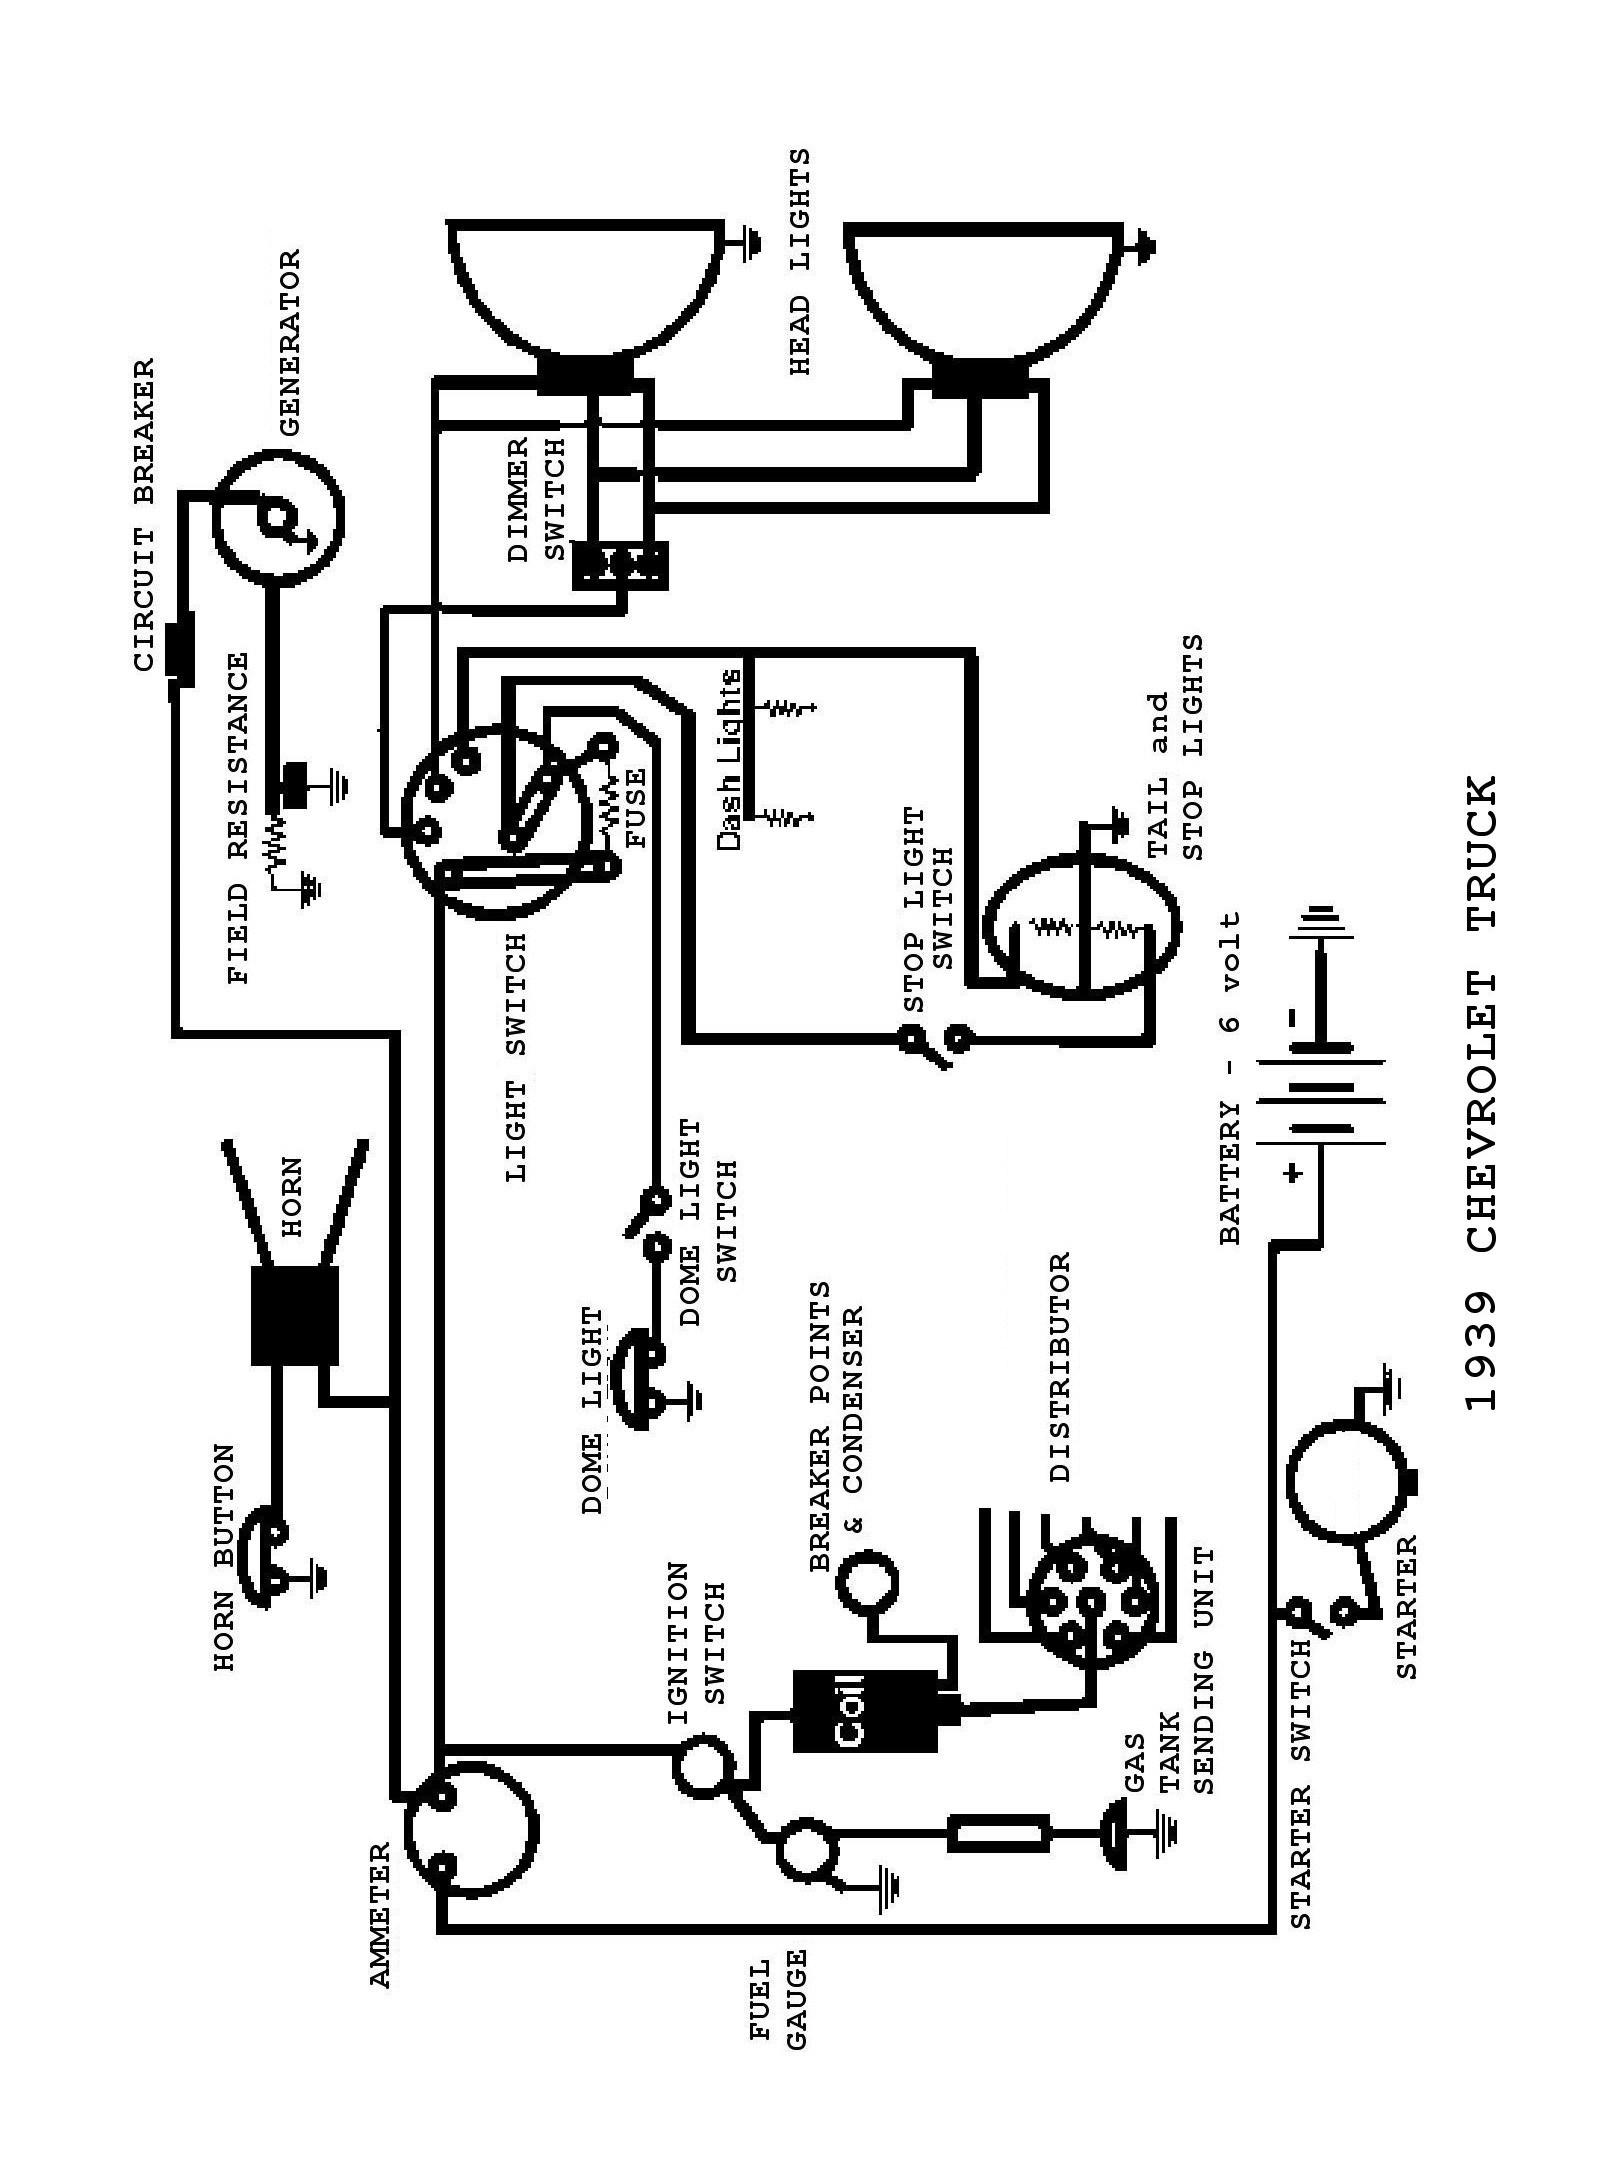 NB_4548] 1086 Ih Cab Wiring Diagram Schematic WiringOtaxy Sheox Icand Seve Hete Kicep Mohammedshrine Librar Wiring 101